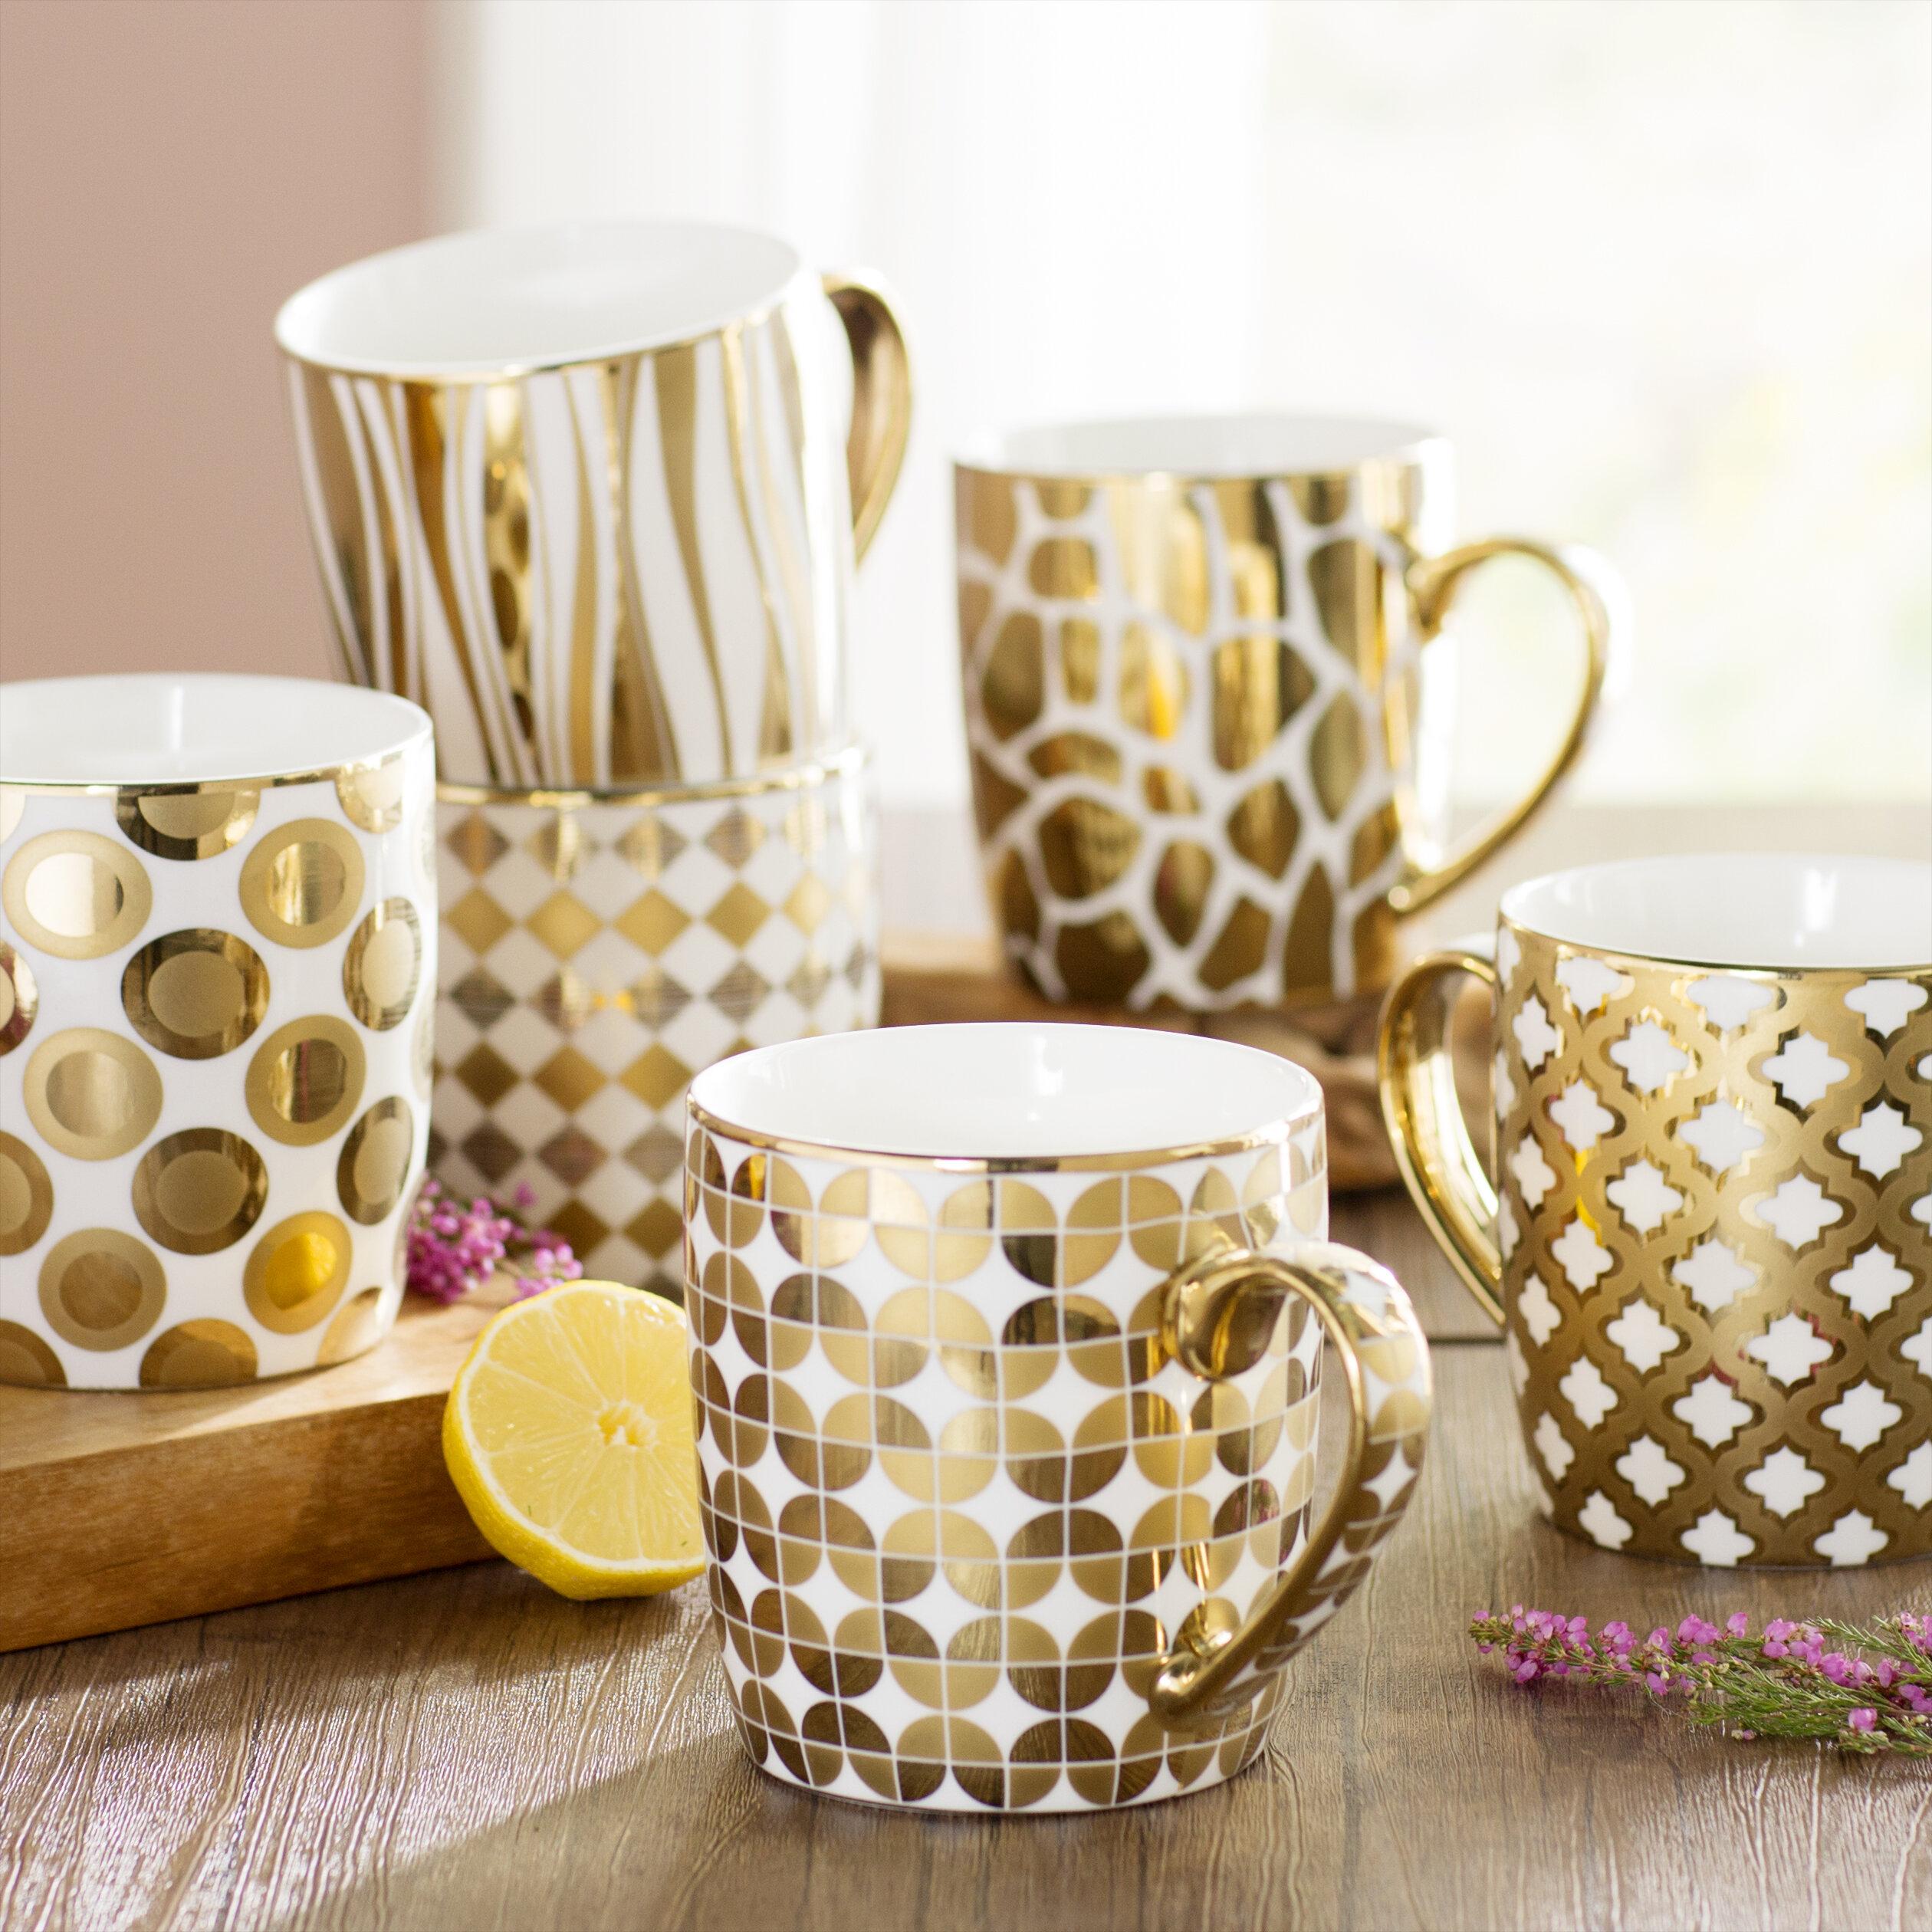 Willa Arlo Interiors Blayze 6 Piece Barrel Coffee Mug Set Reviews Wayfair